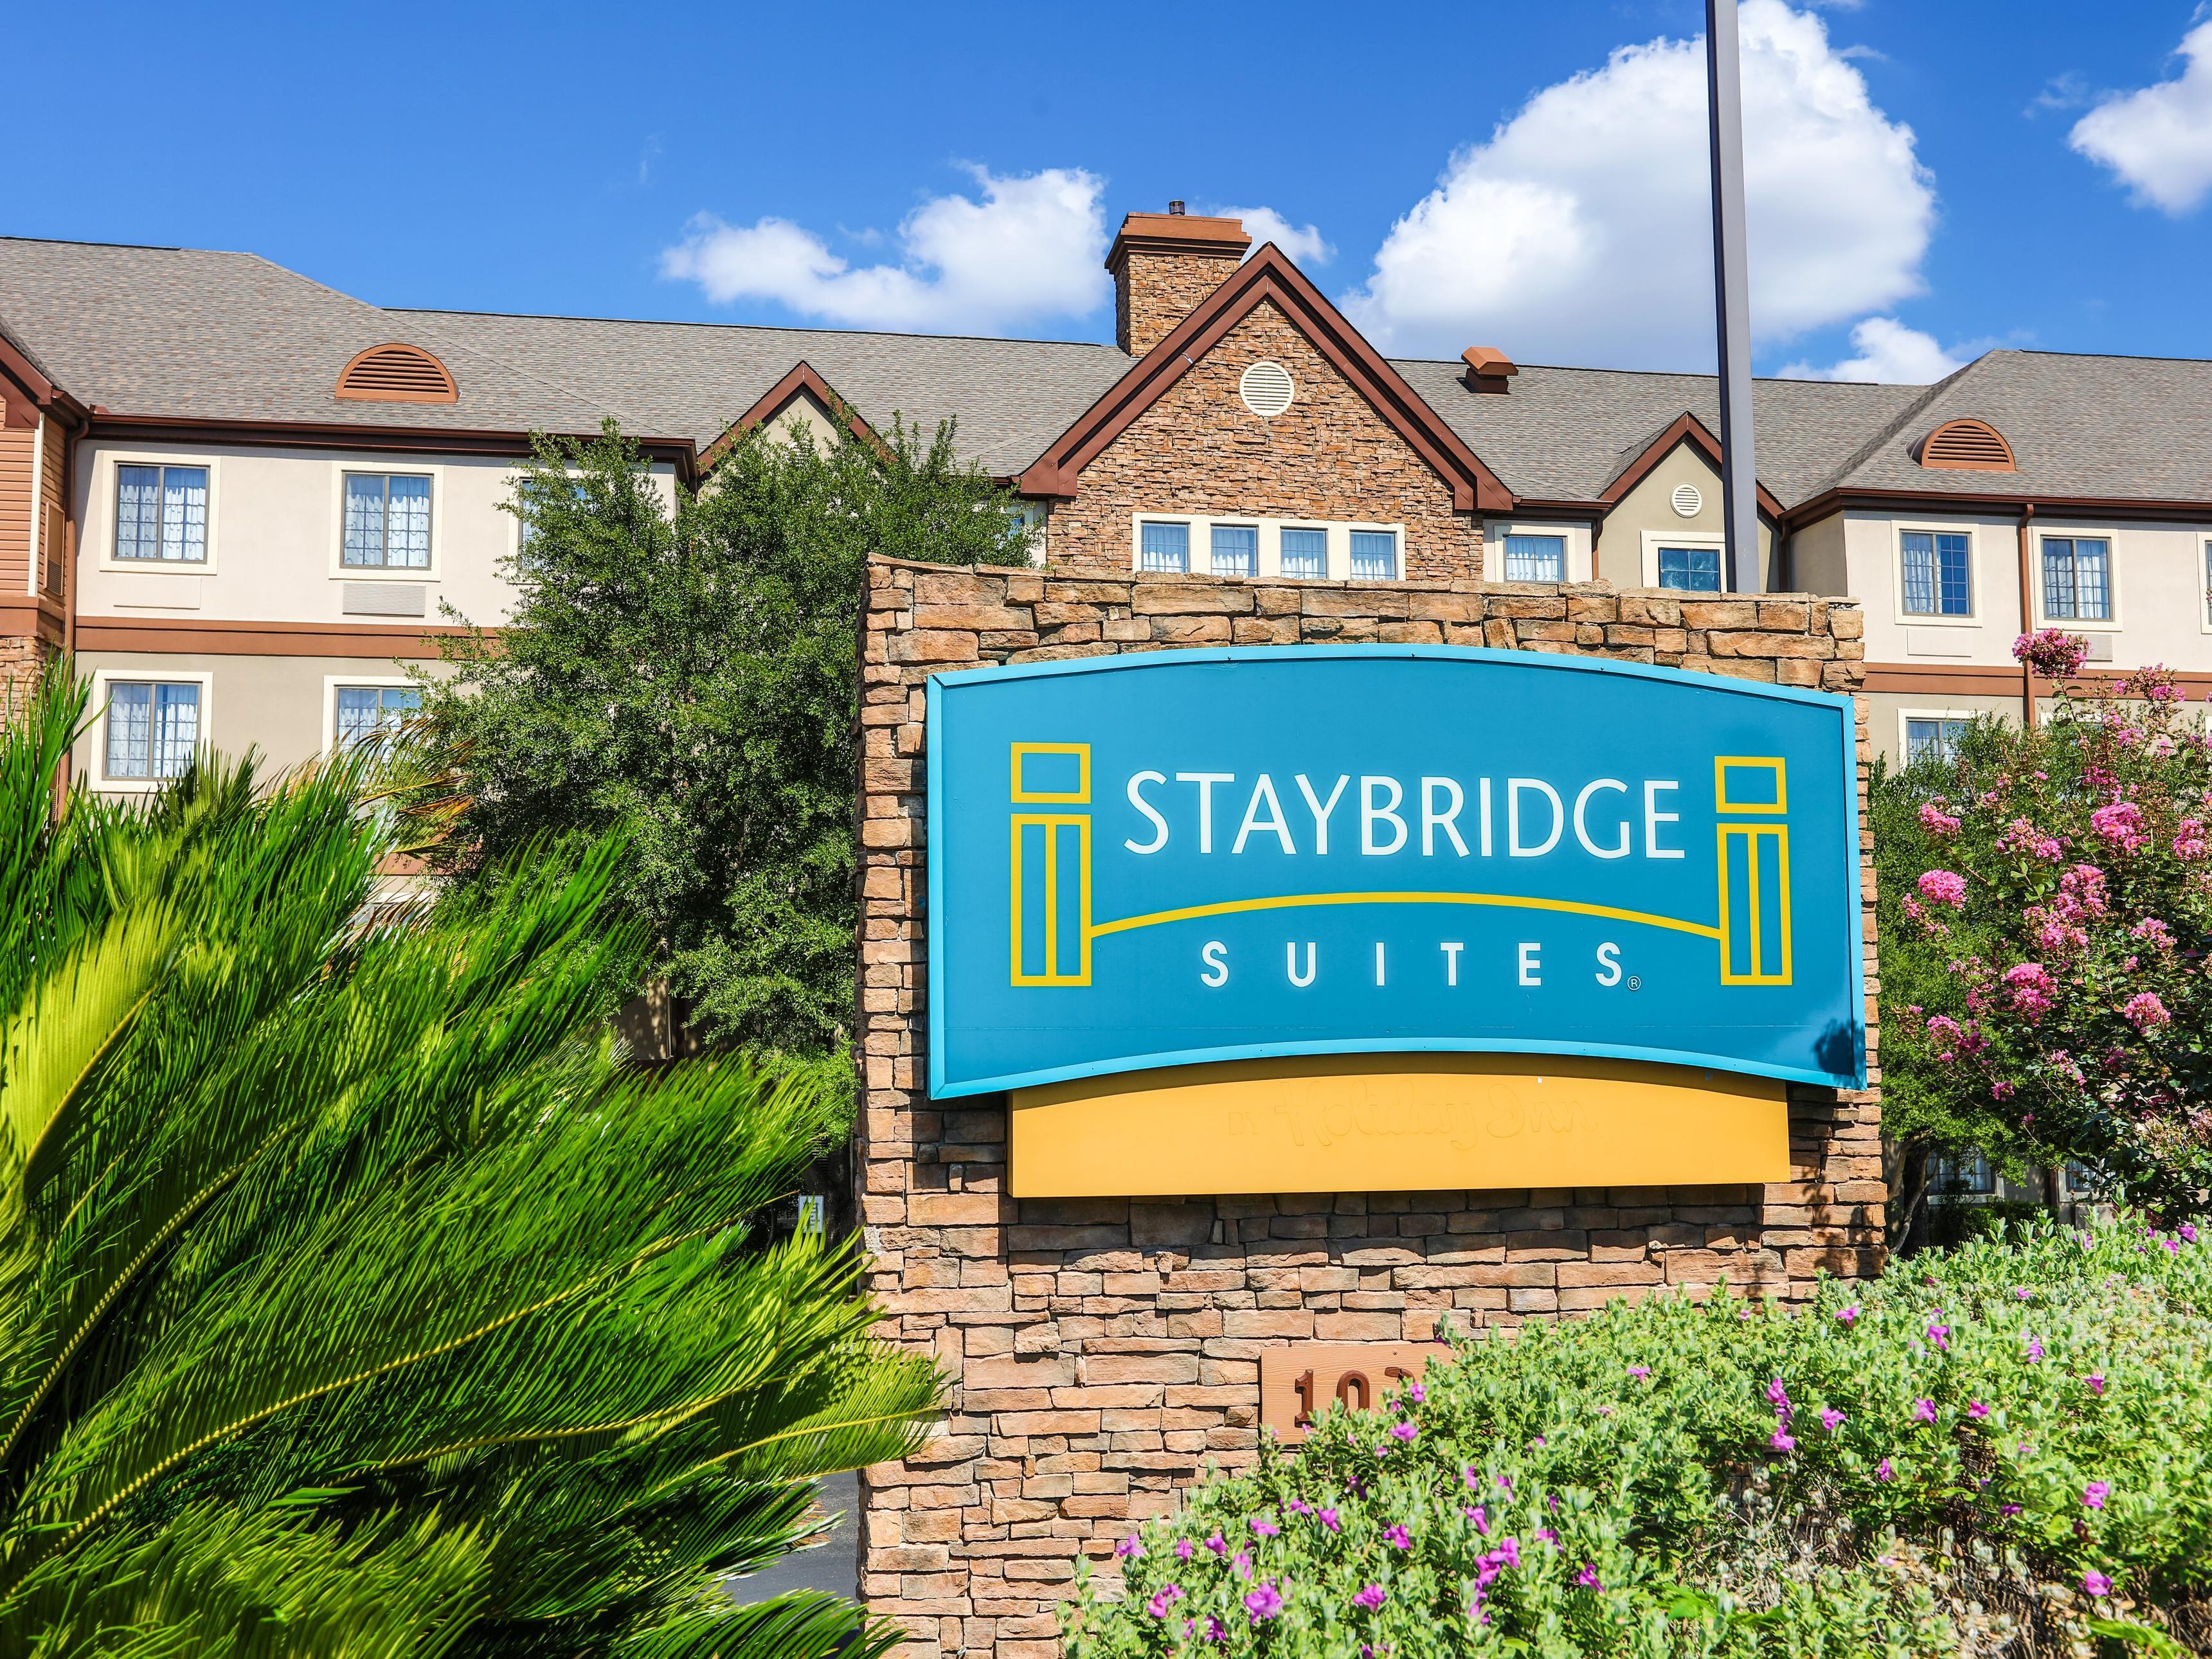 austin hotels staybridge suites austin arboretum. Black Bedroom Furniture Sets. Home Design Ideas